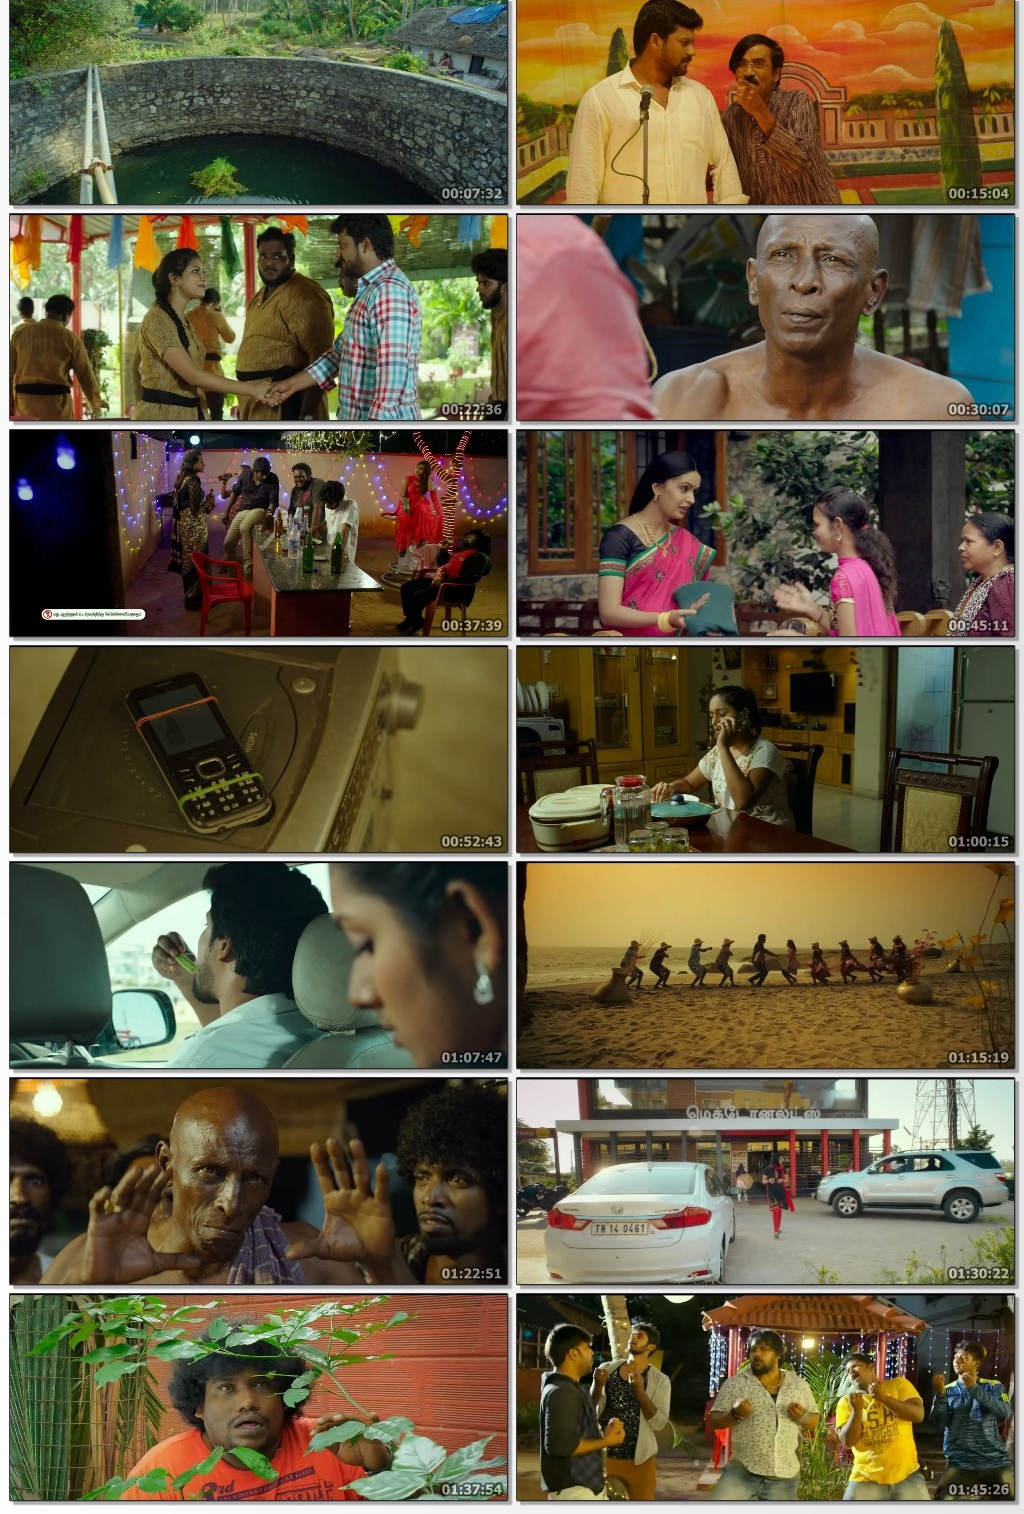 Engada-Iruthinga-Ivvalavu-Naala-2021-www-1kmovies-cyou-Tamil-720p-HDRip-ESub-1-2-GB-mkv-thumbs